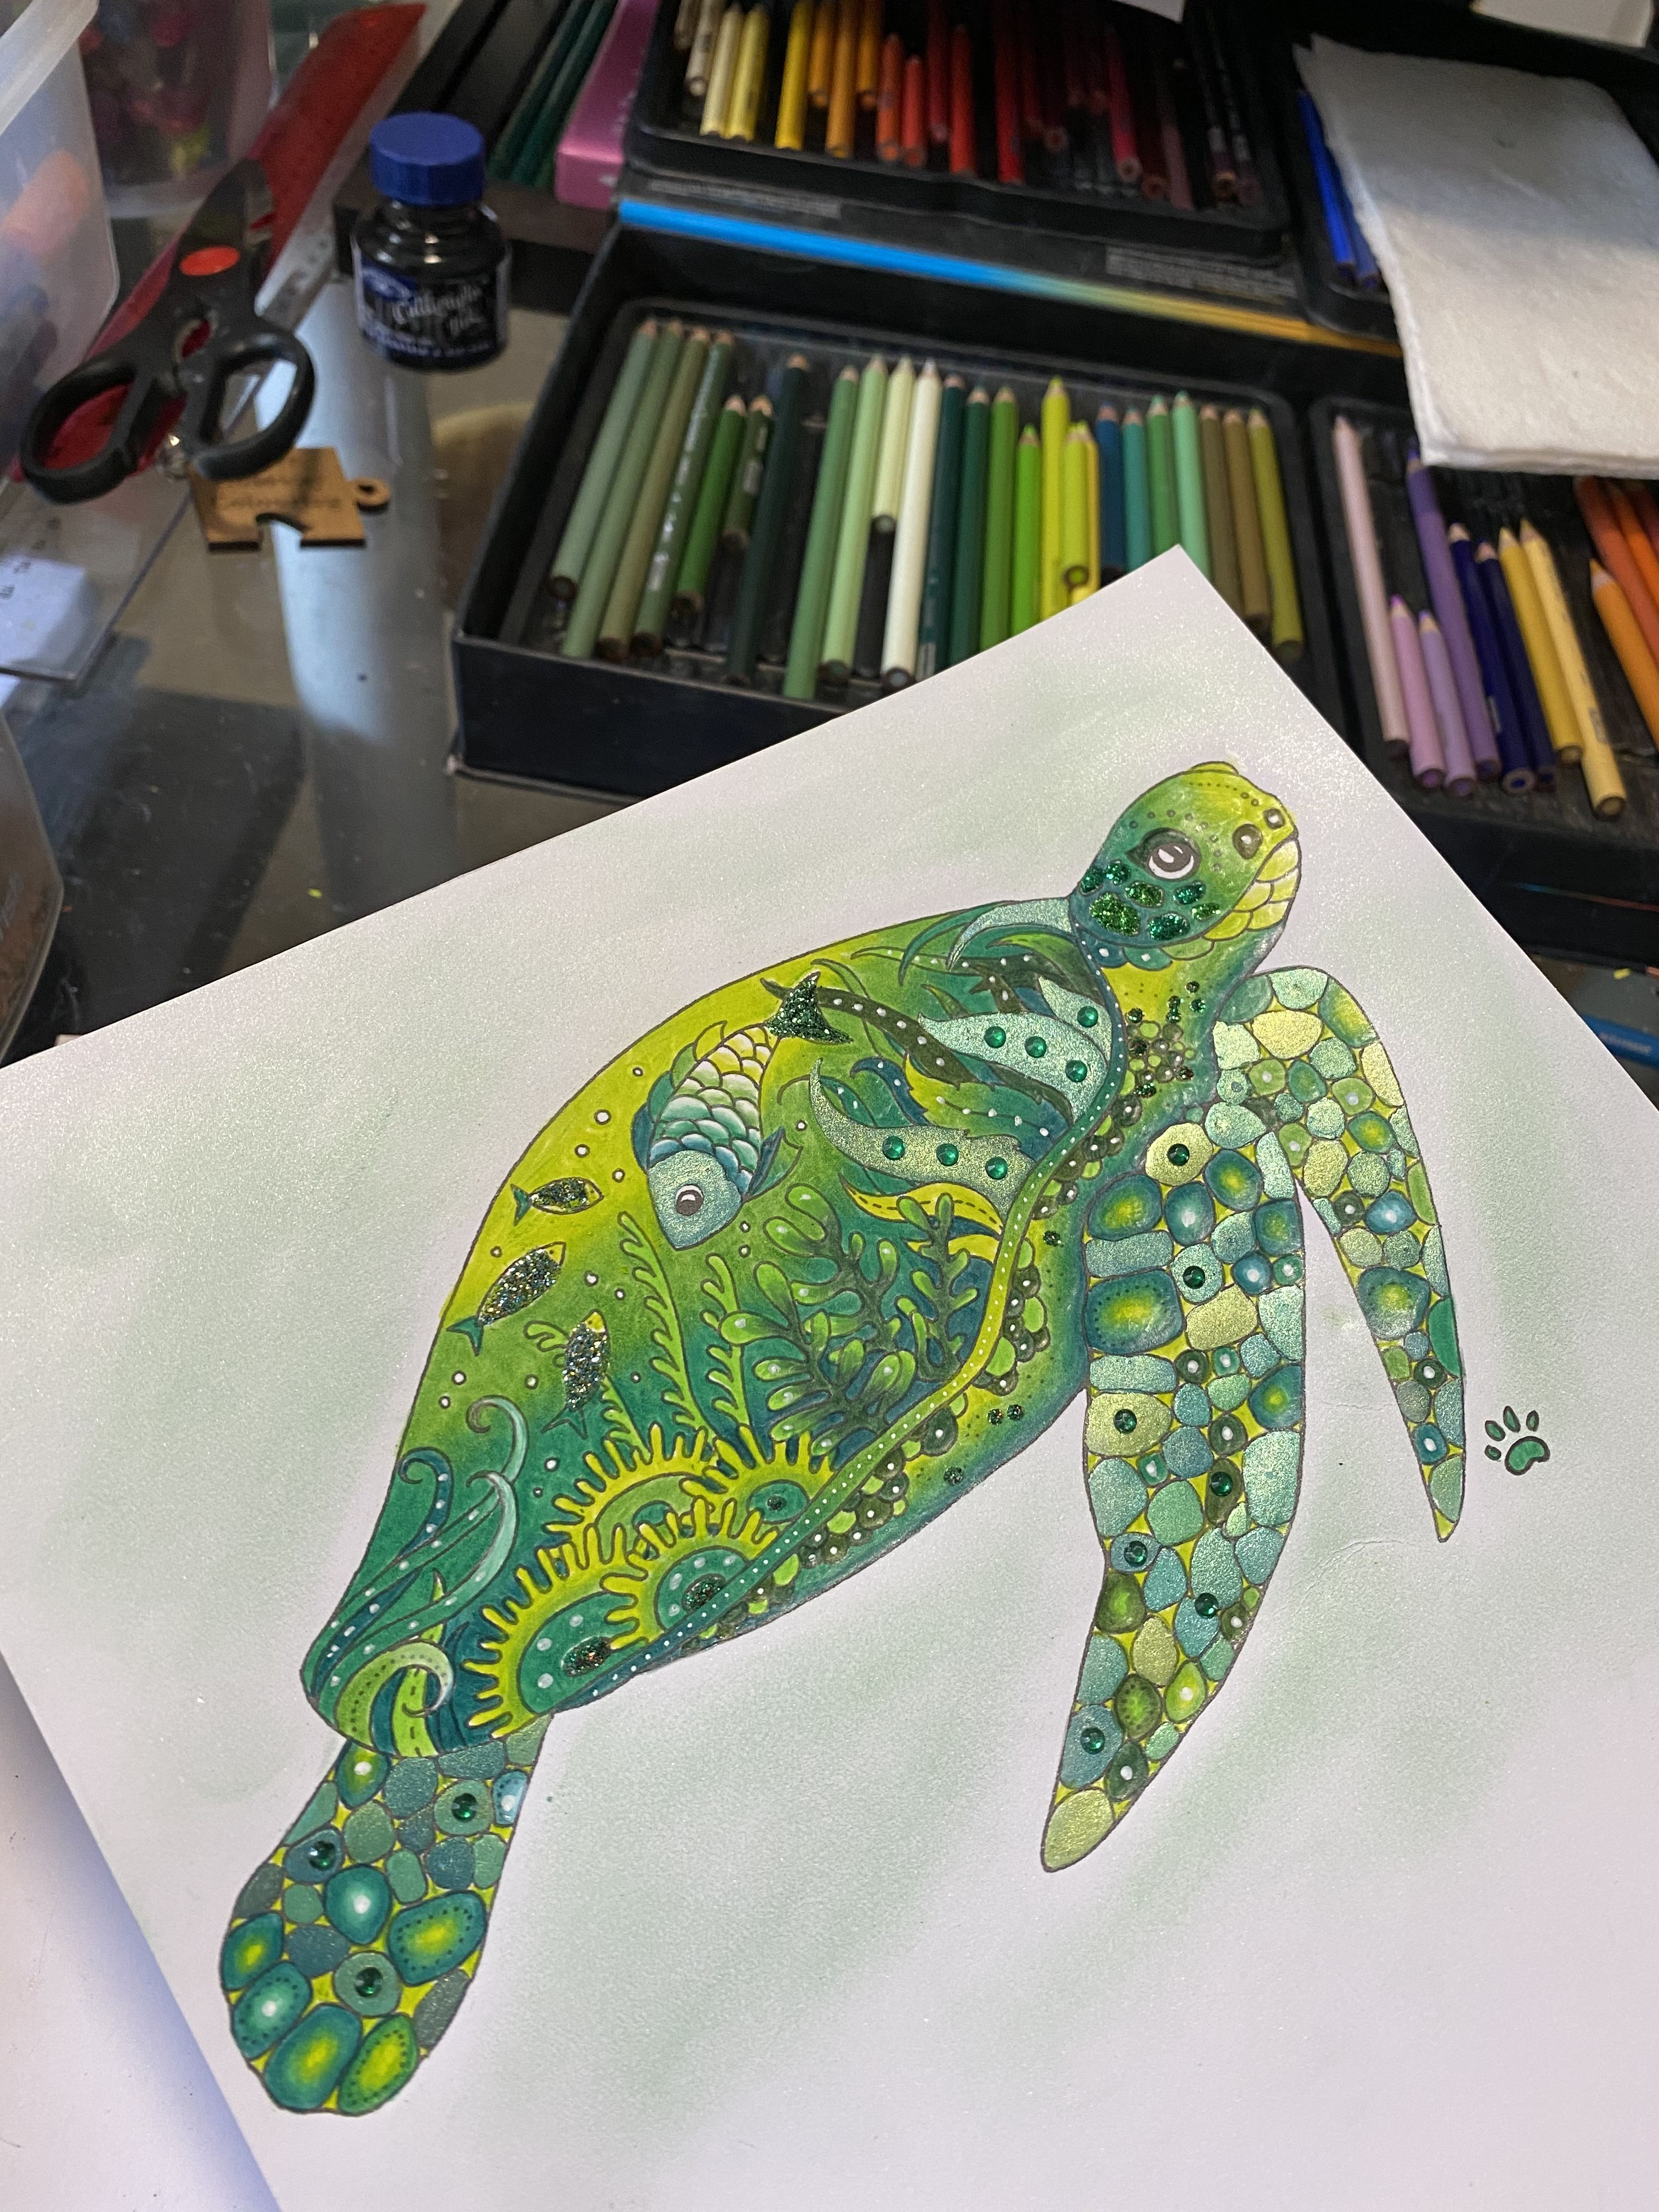 Terry Turtle Johanna Basford Coloring Book Johanna Basford Johanna Basford Enchanted Forrest